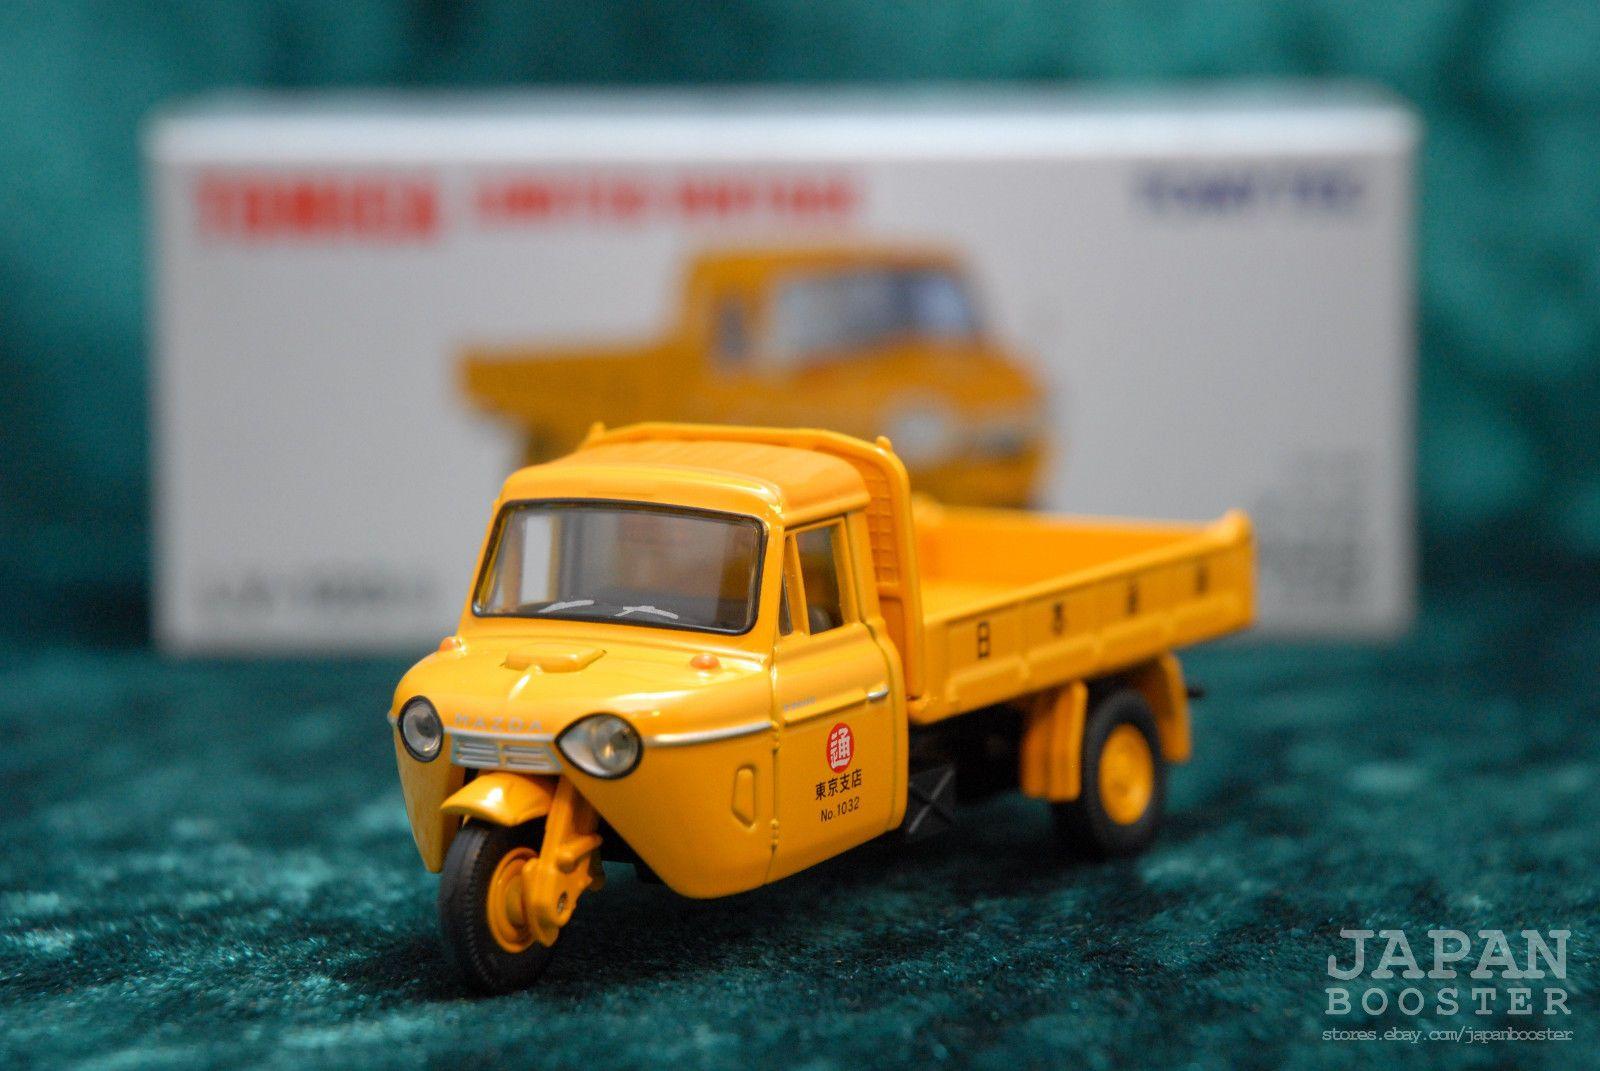 Tomica Limited Vintage Lv 123b 1 64 Mazda T2000 Dump Truck Yellow Ebay Diecast Mazda Diecast Toy